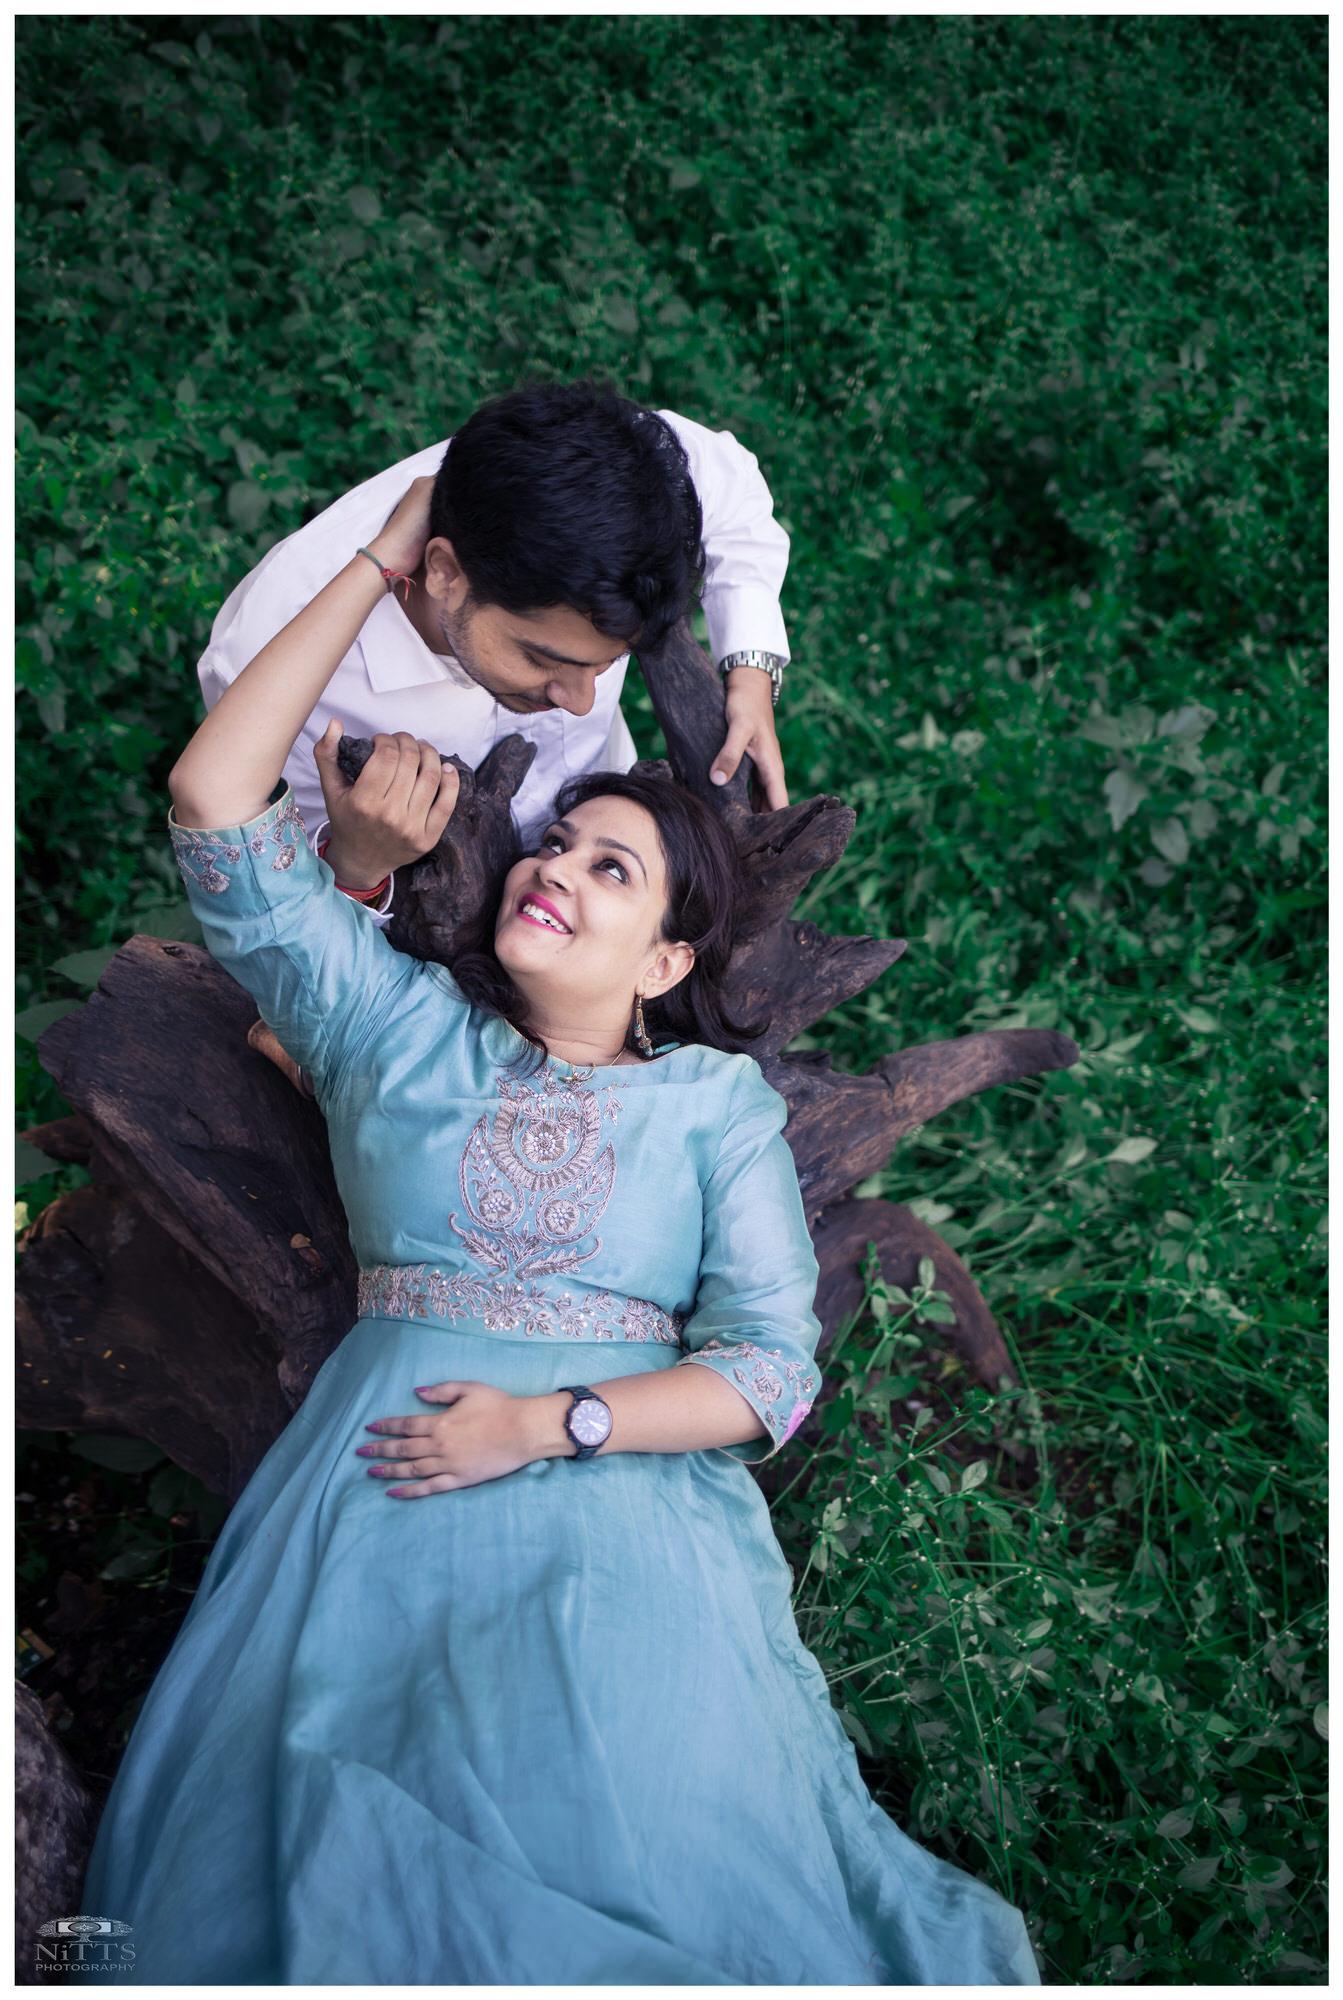 Prateek & Abhilasha (Pre-wedding)-October 30, 2017-24.JPG